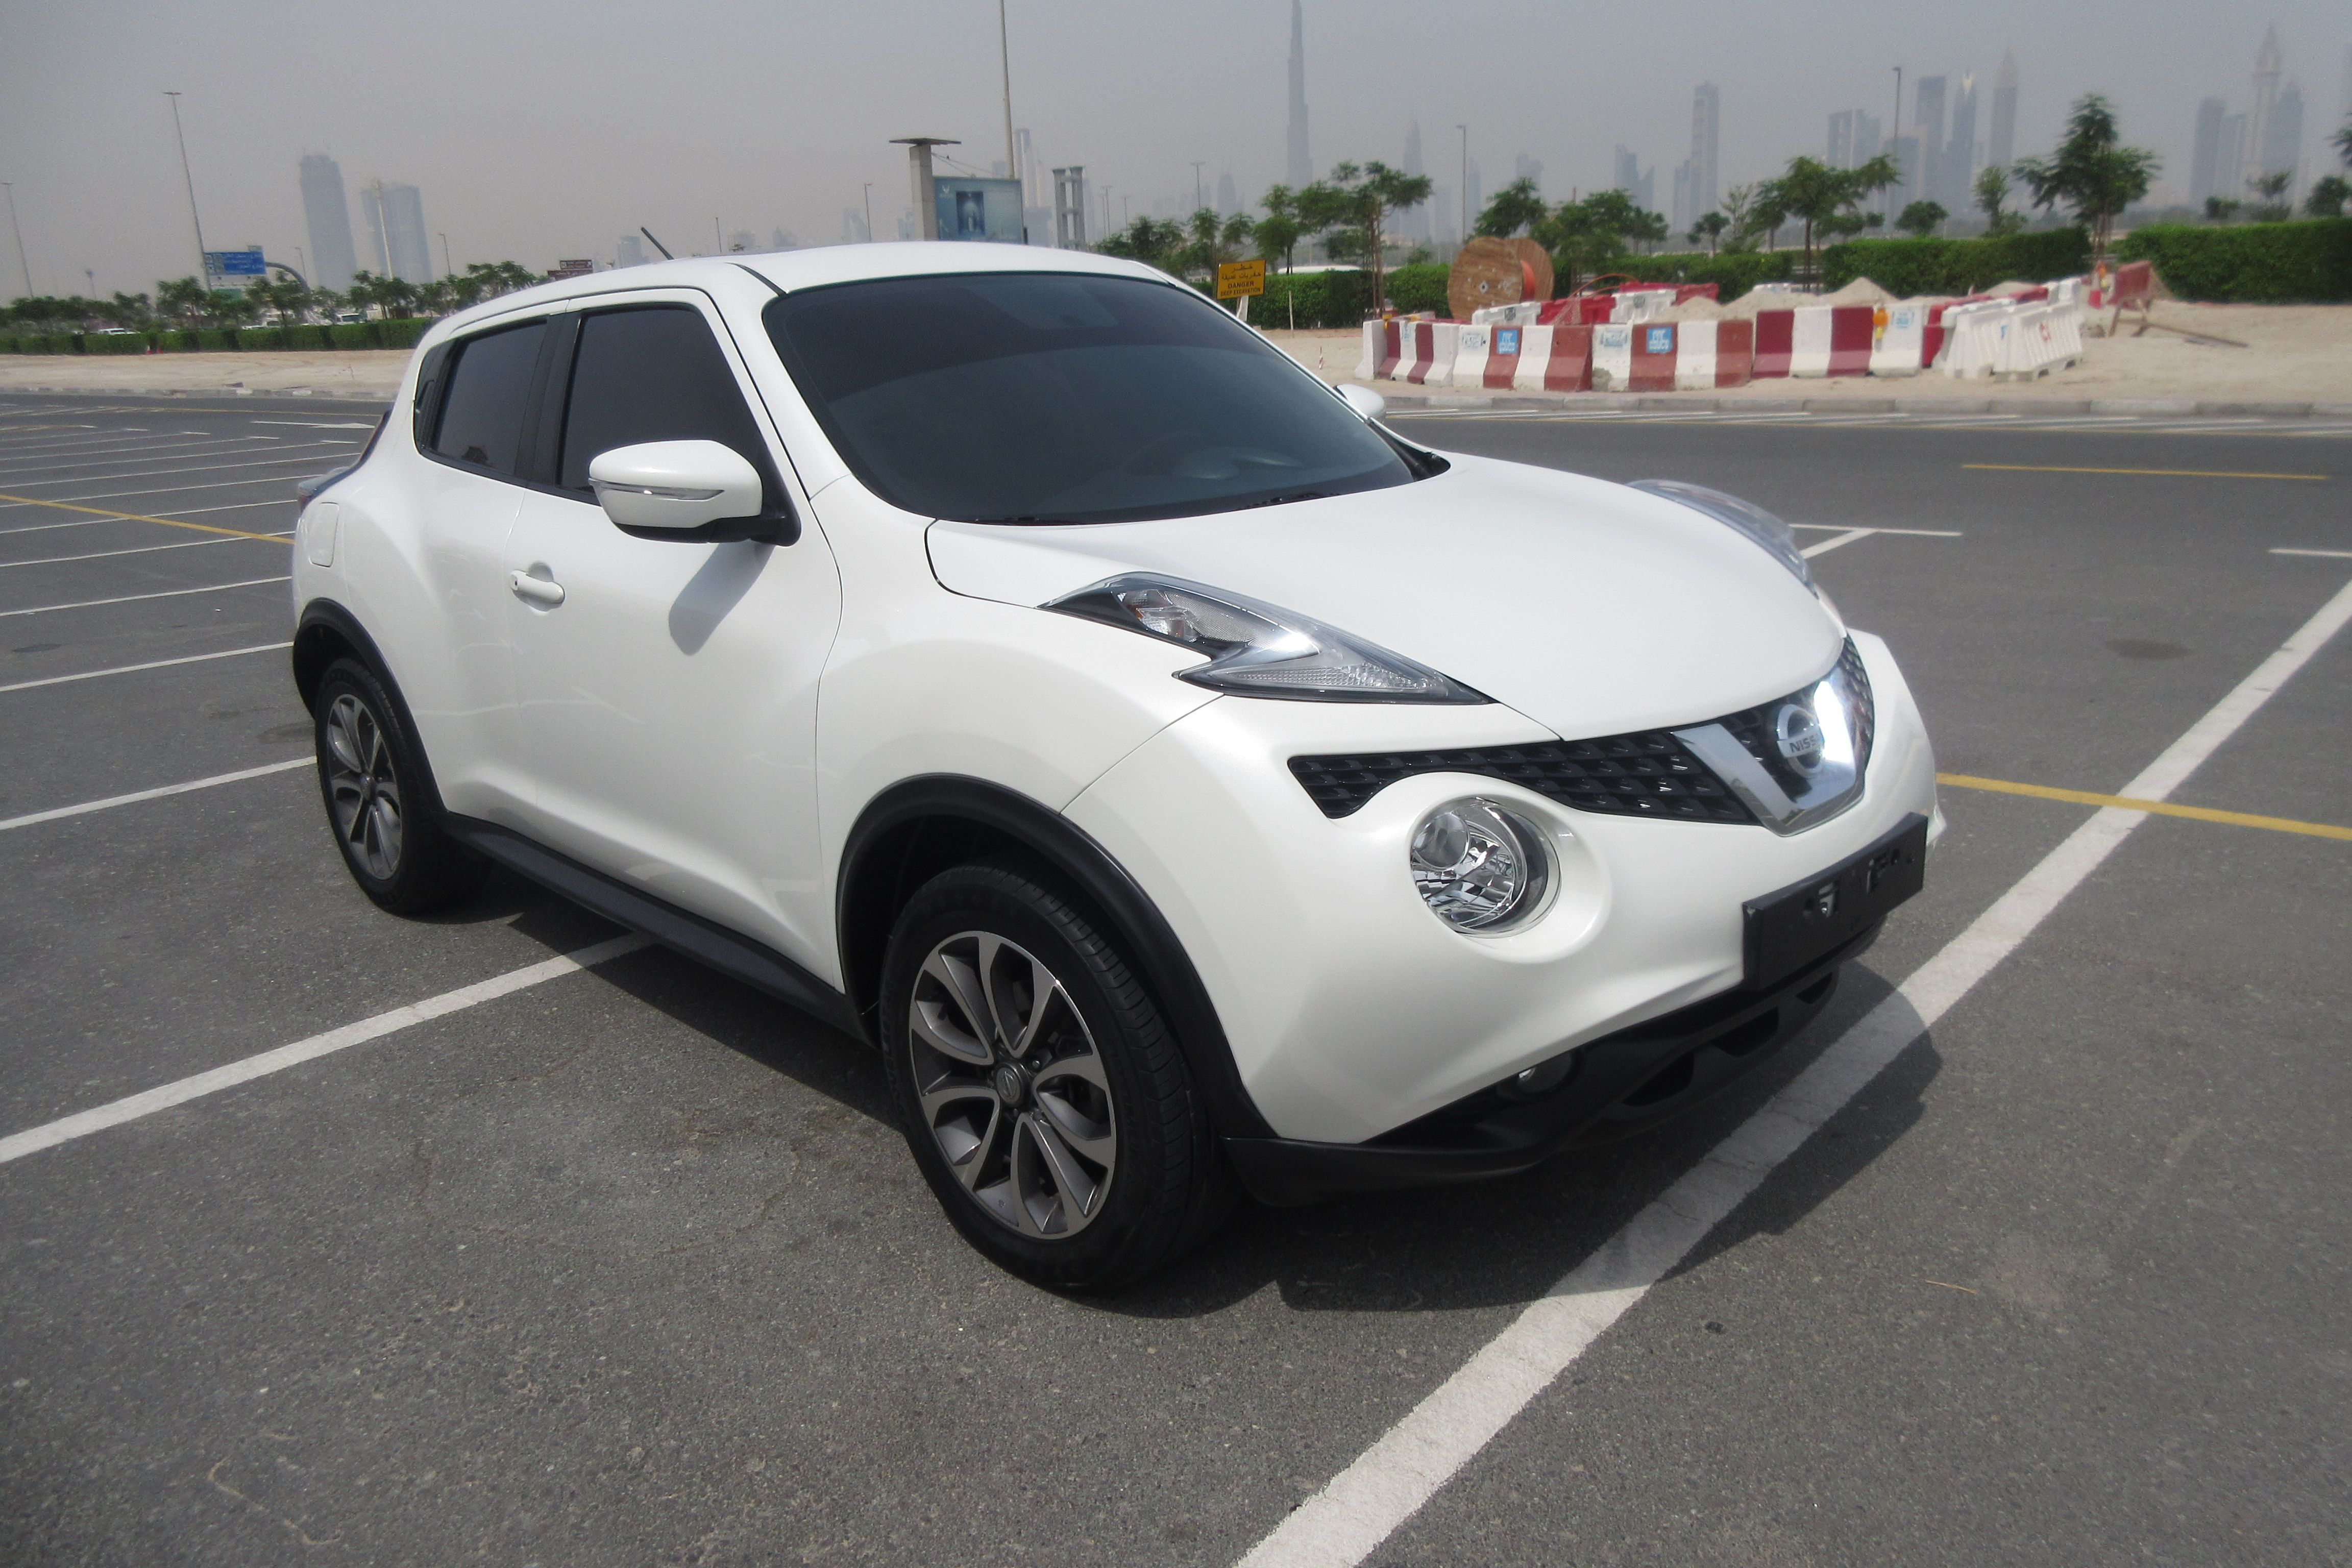 2016 Nissan Juke Fulloption Zero Down Payment 100 Bank Loan 930 Monthly Nissan Juke Nissan Find Used Cars